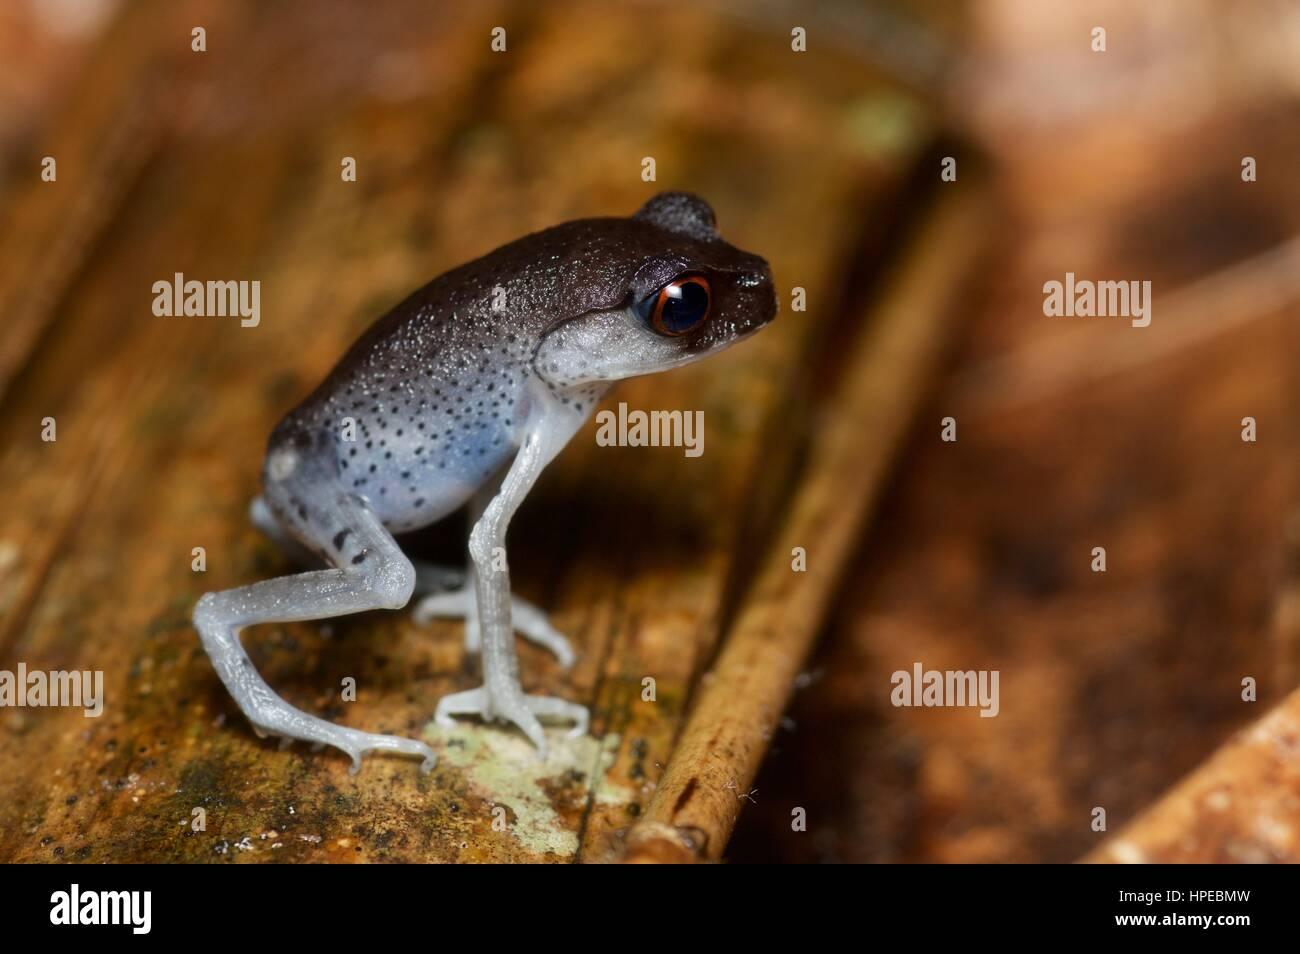 A Spotted Litter Frog (Leptobrachium hendricksoni) on the forest floor at night in Ulu Semenyih, Selangor, Malaysia Stock Photo